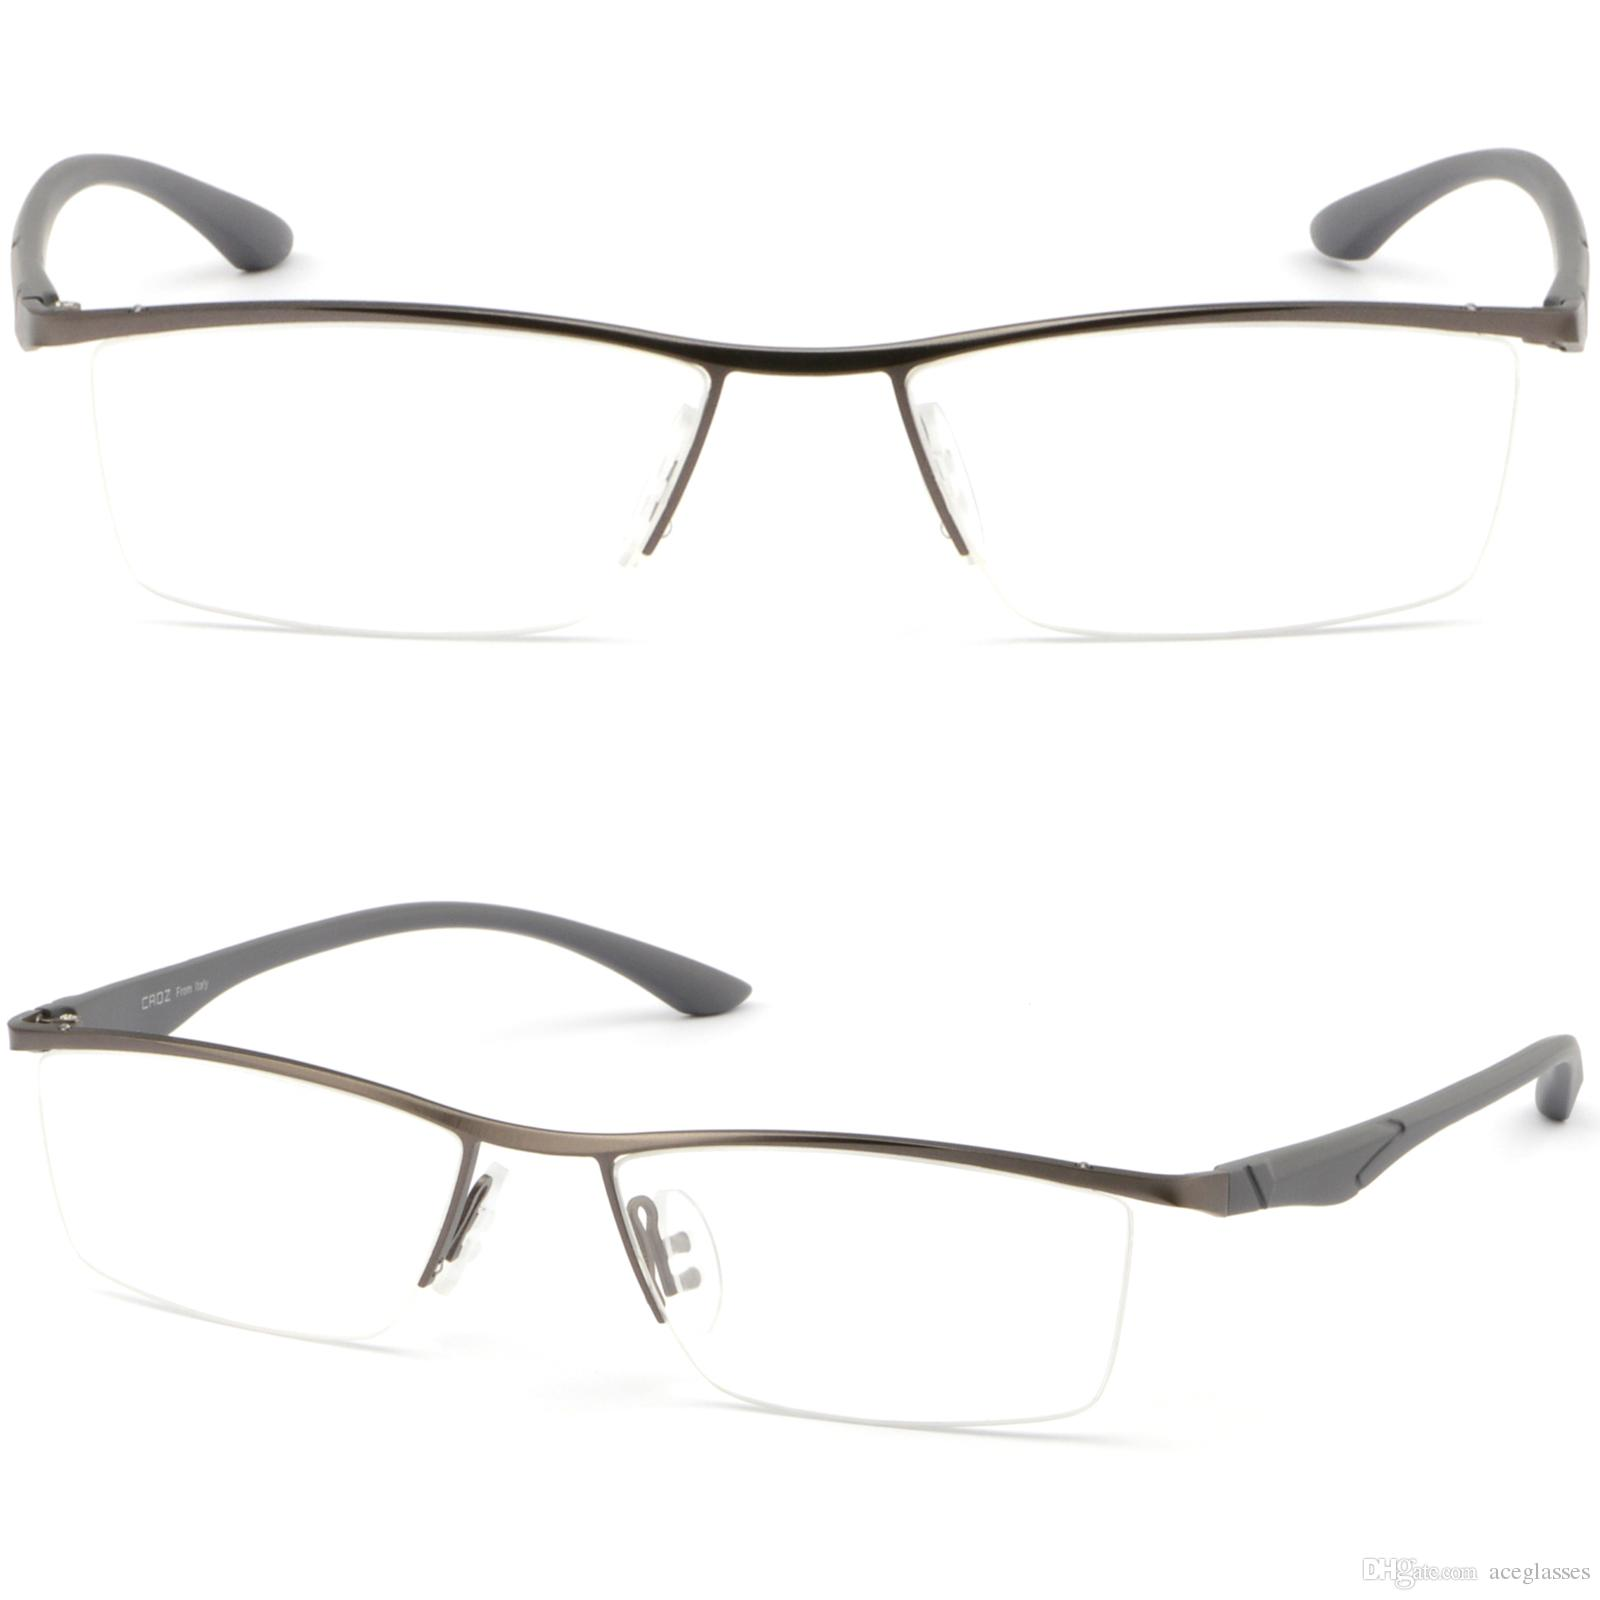 mens womens titanium frame metal prescription glasses sunglasses anti glare gray glasses frame online with 3423piece on aceglassess store dhgatecom - Best Online Prescription Glasses